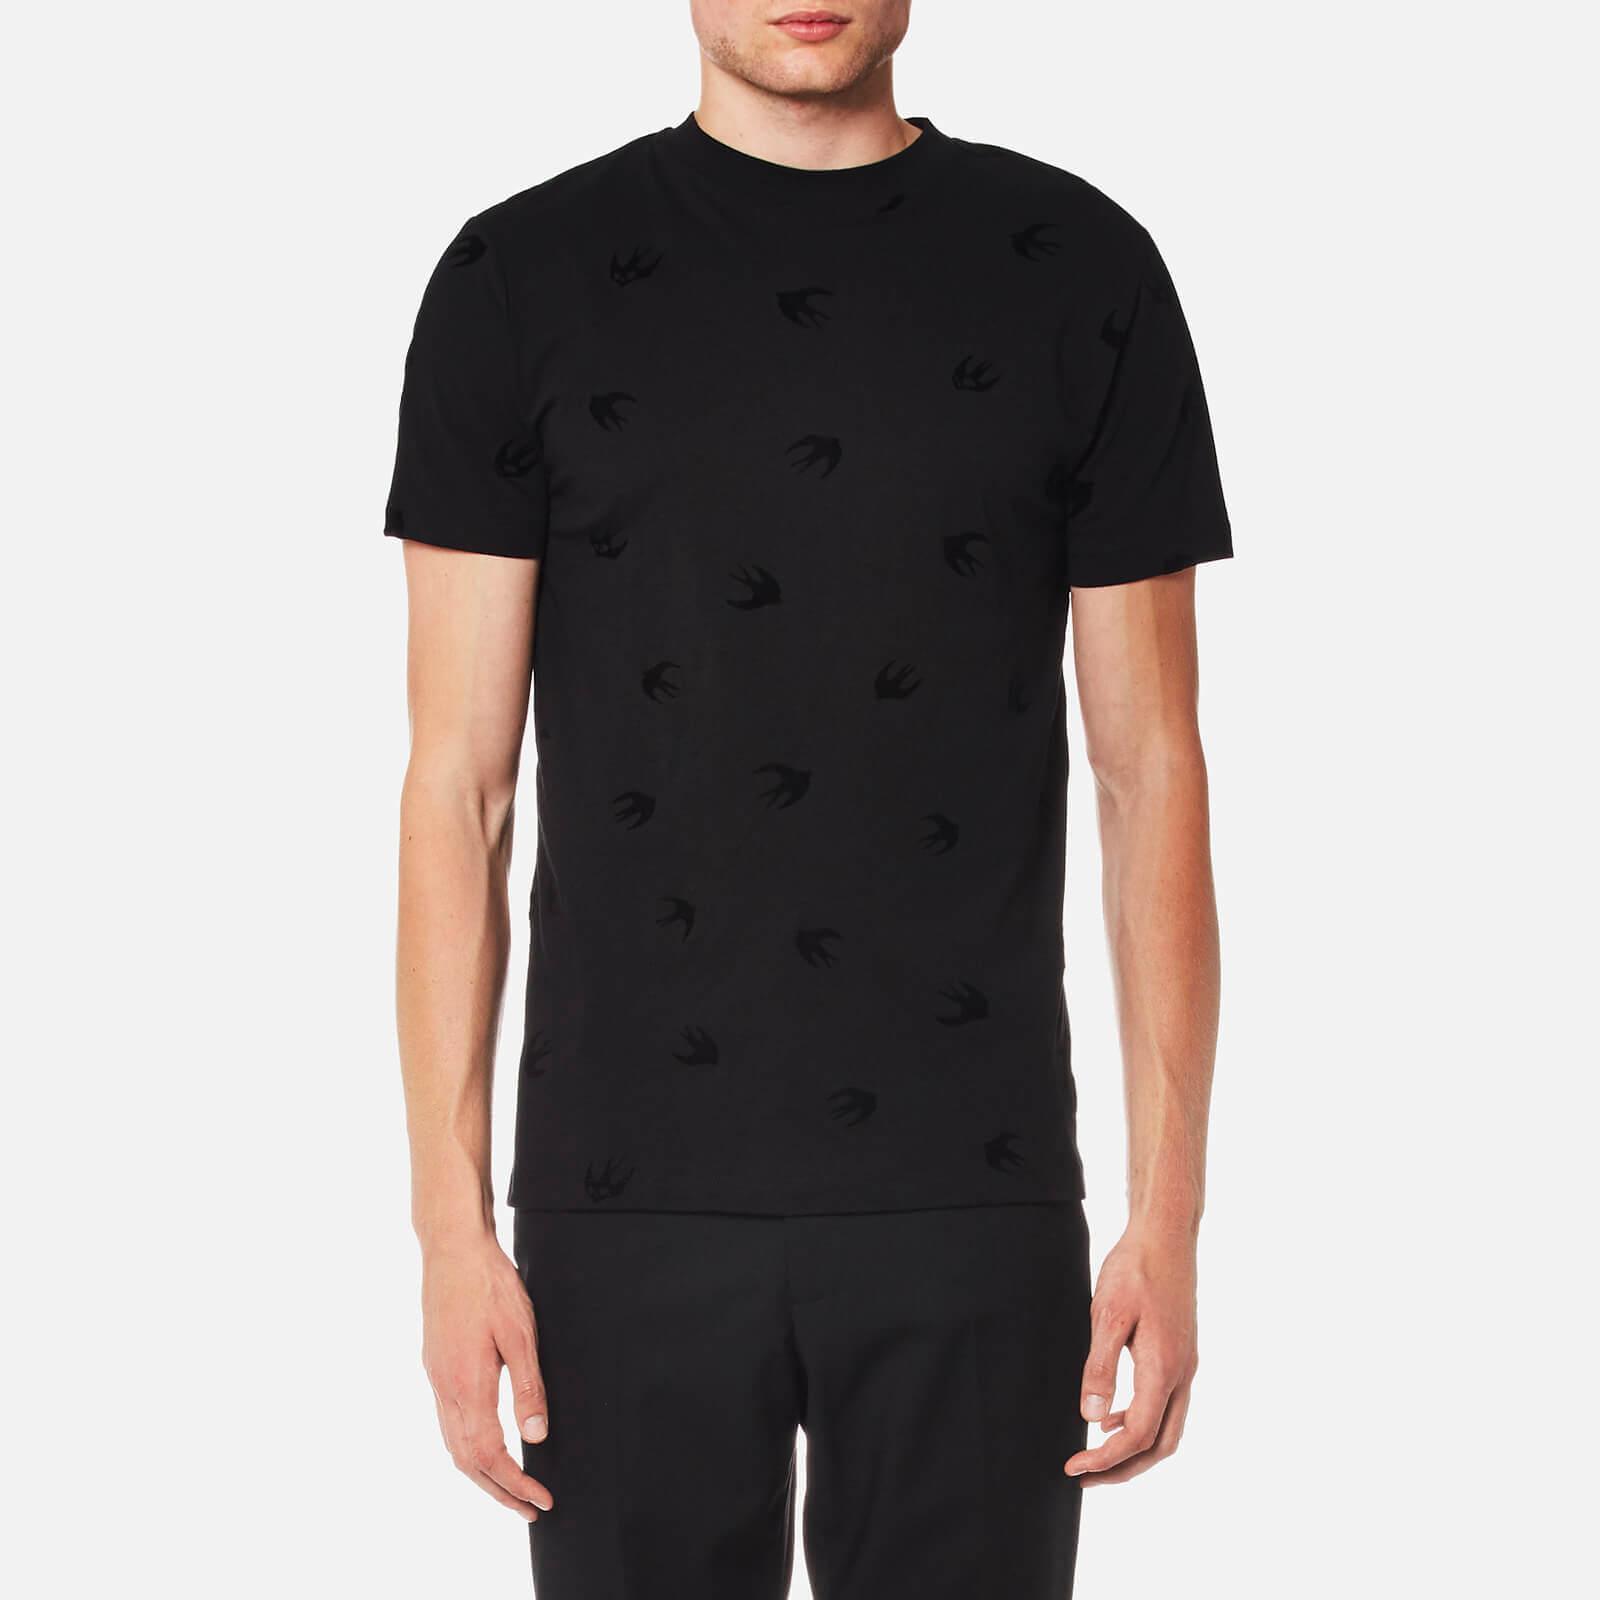 a60f43b4895 McQ Alexander McQueen Men s Swallow T-Shirt - Darkest Black - Free UK  Delivery over £50